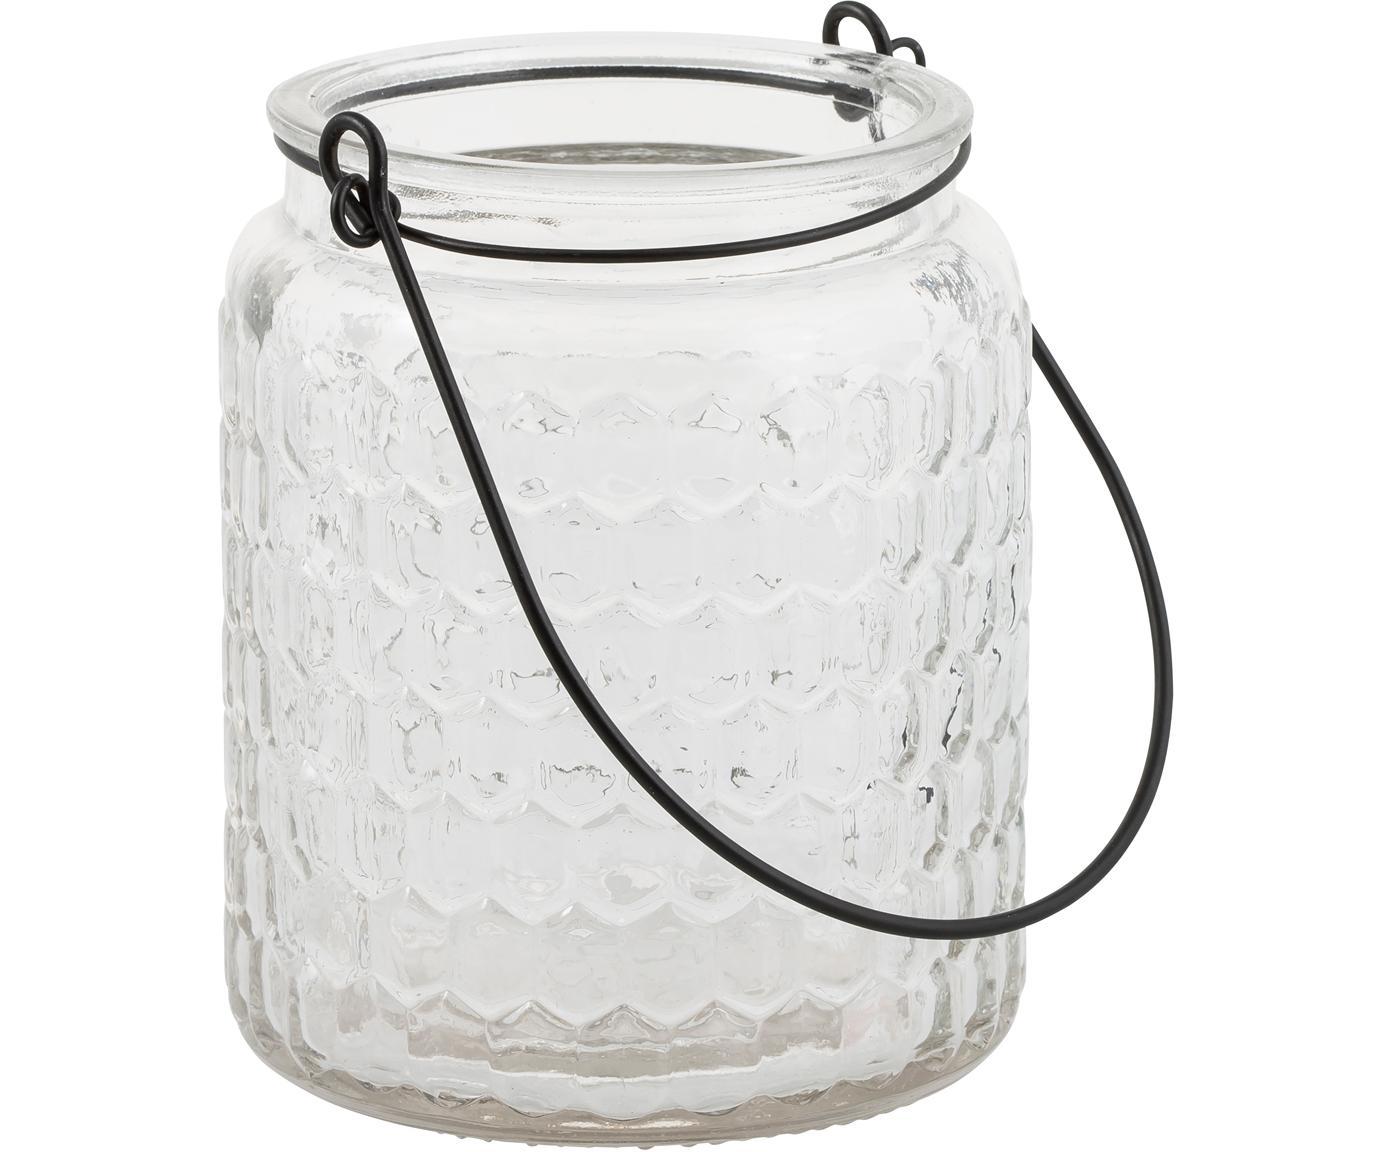 Lanterna Alsace, Vetro, metallo, Trasparente, nero, Ø 10 x Alt. 12 cm